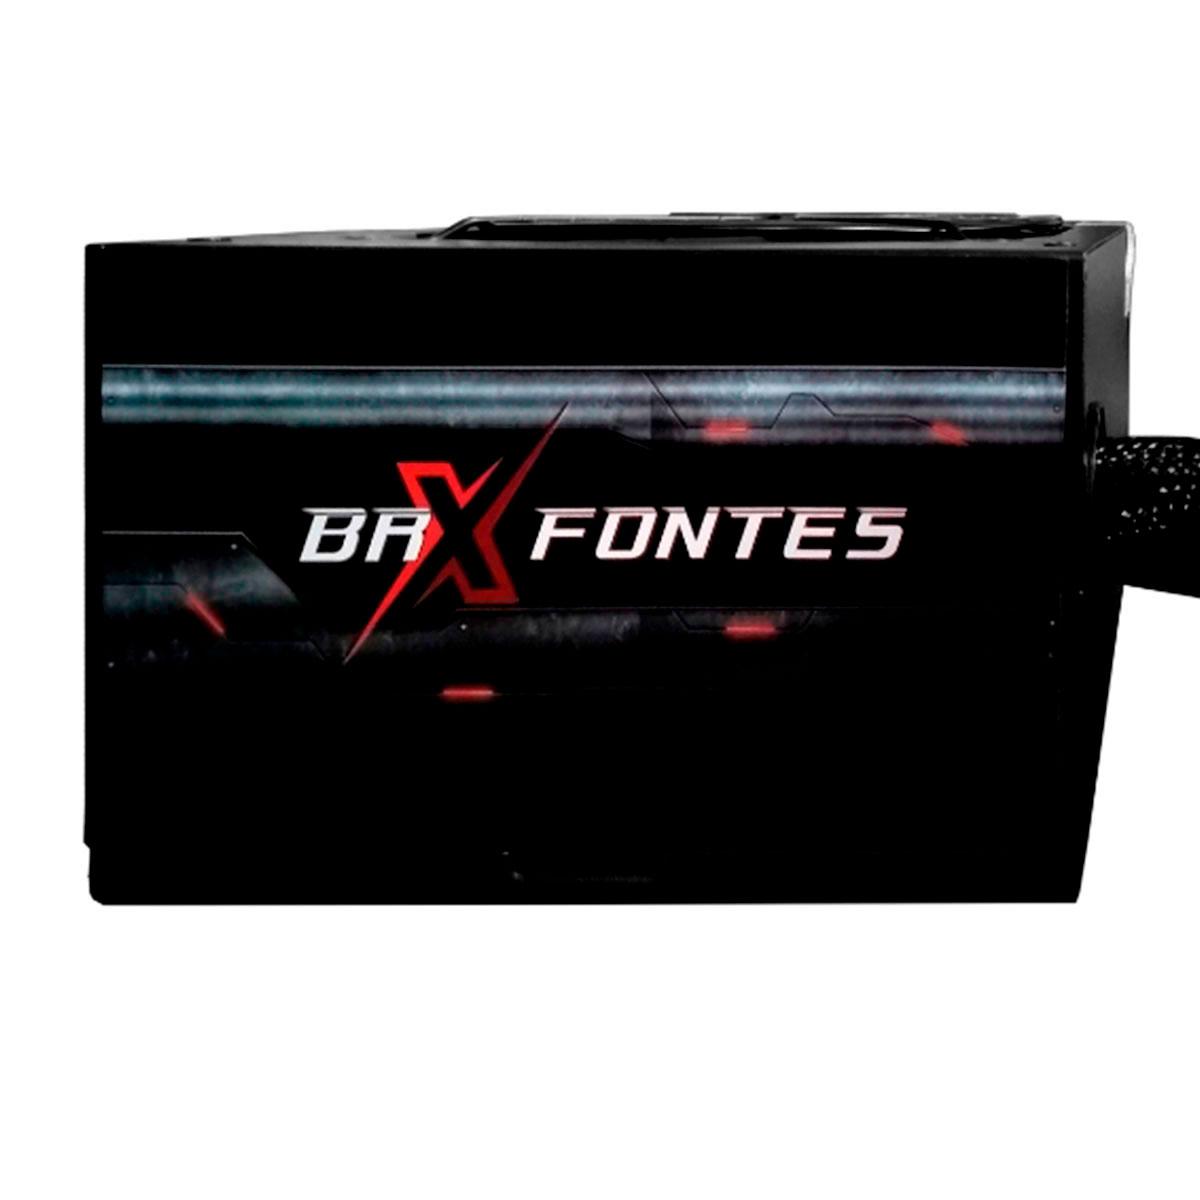 Fonte Gamer ATX BRX B-S700W, 700W Real, Cooler120mm, Bivolt Chaveada